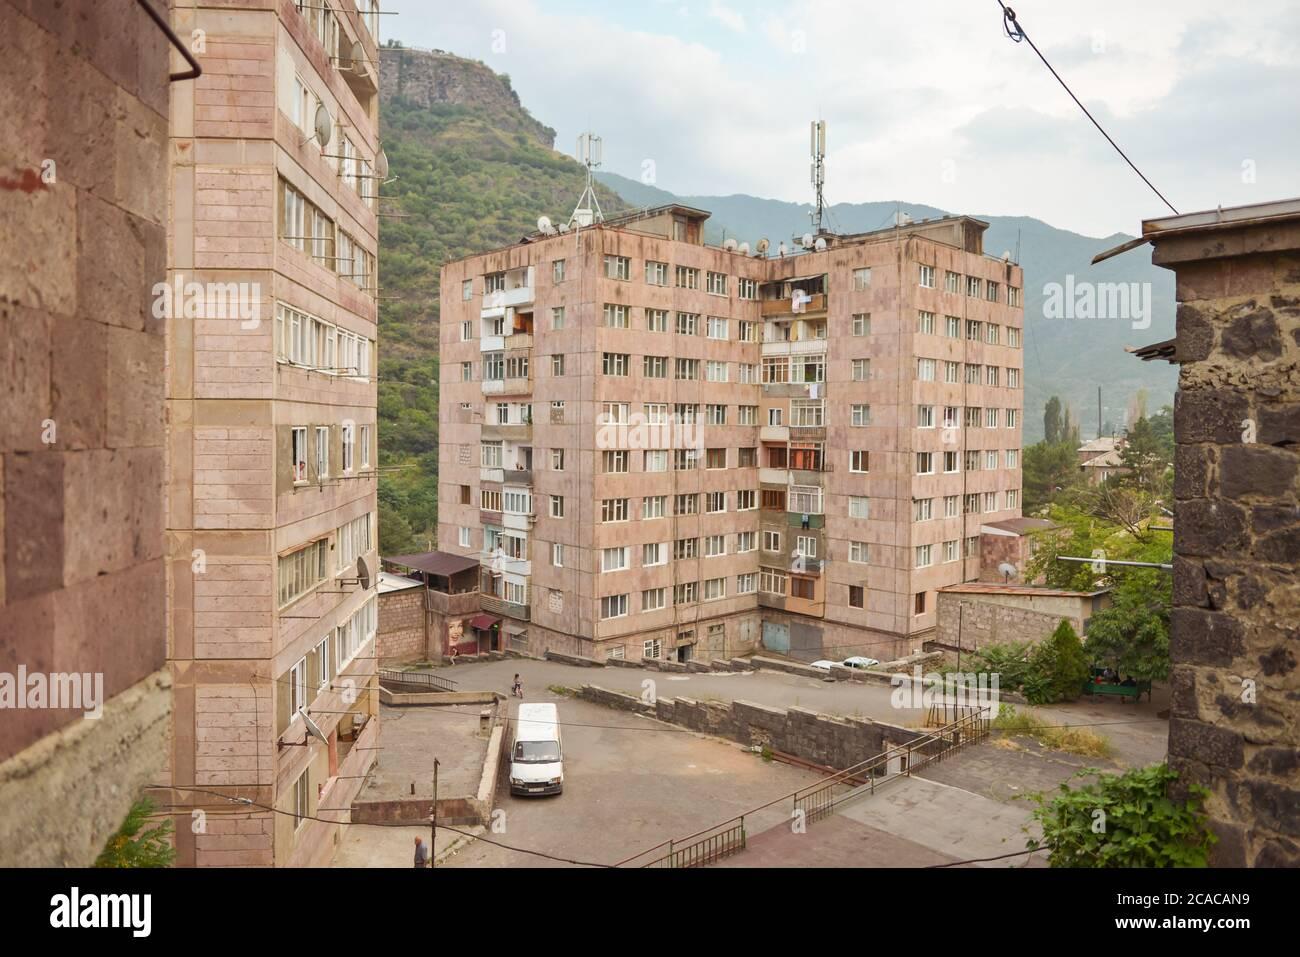 Alaverdi / Armenia - July 20, 2019: Soviet style buildings and vehicles from the streets of Alaverdi Stock Photo